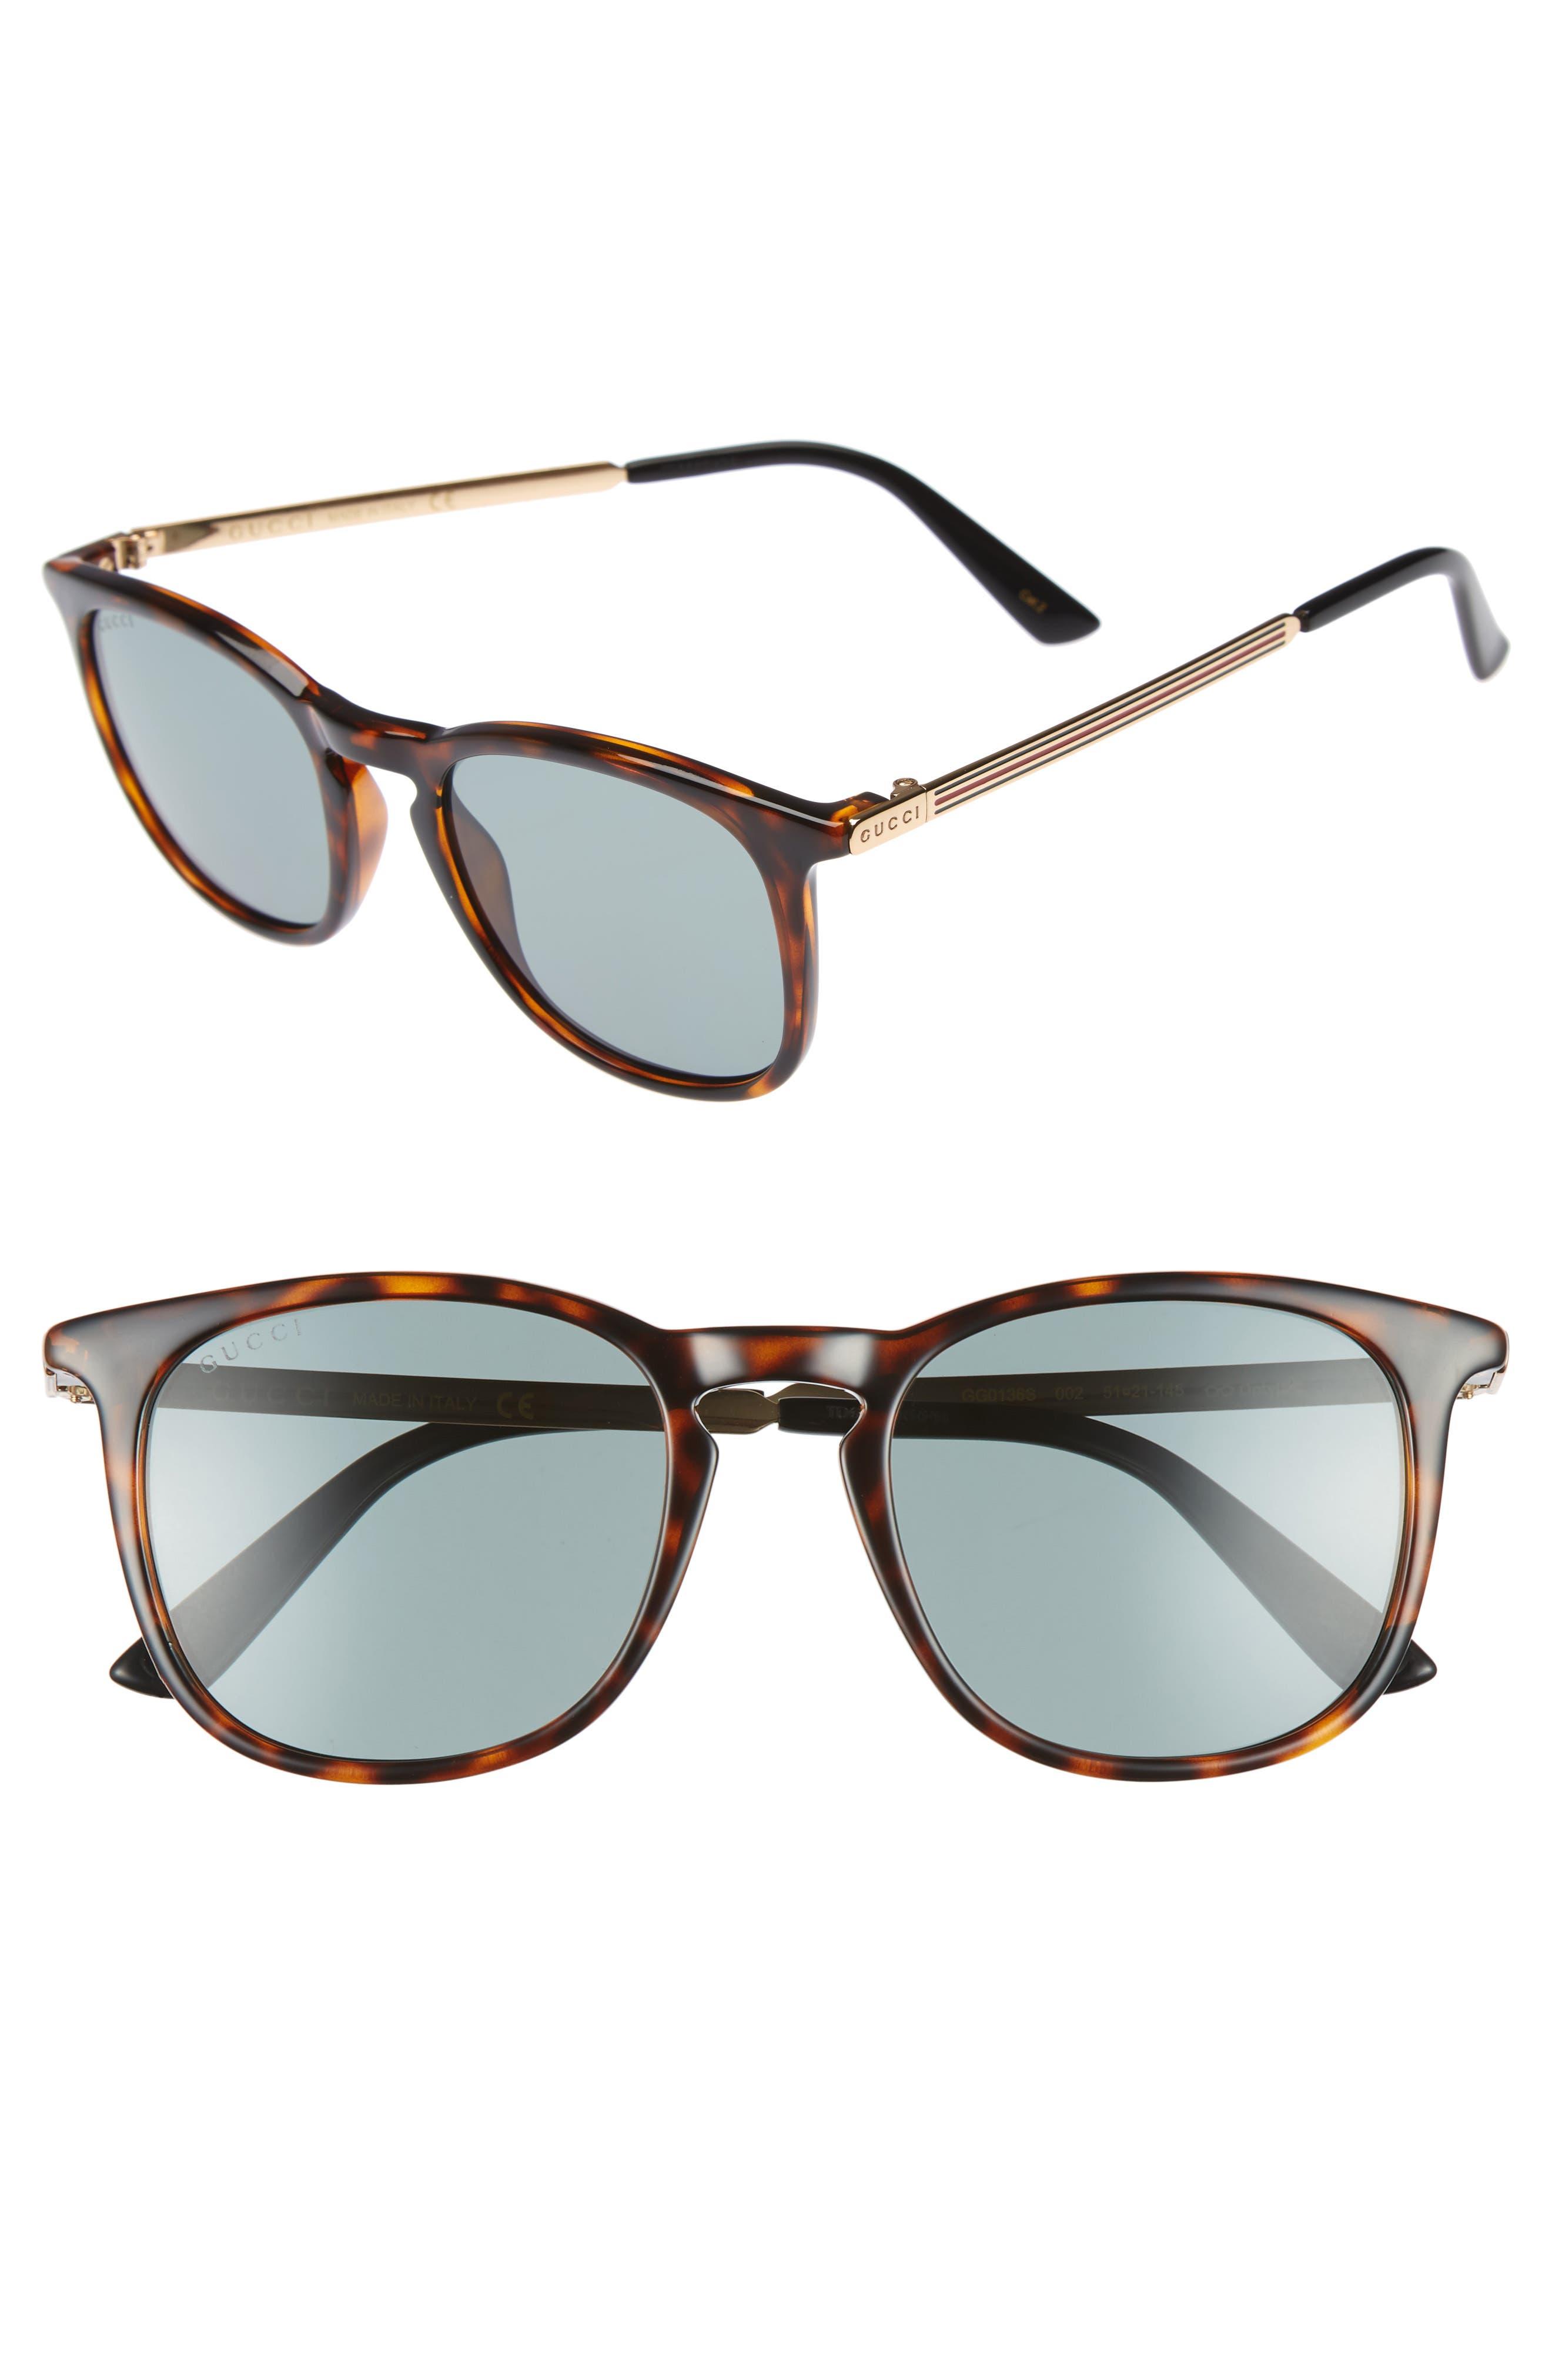 Optyl 51mm Sunglasses,                             Main thumbnail 2, color,